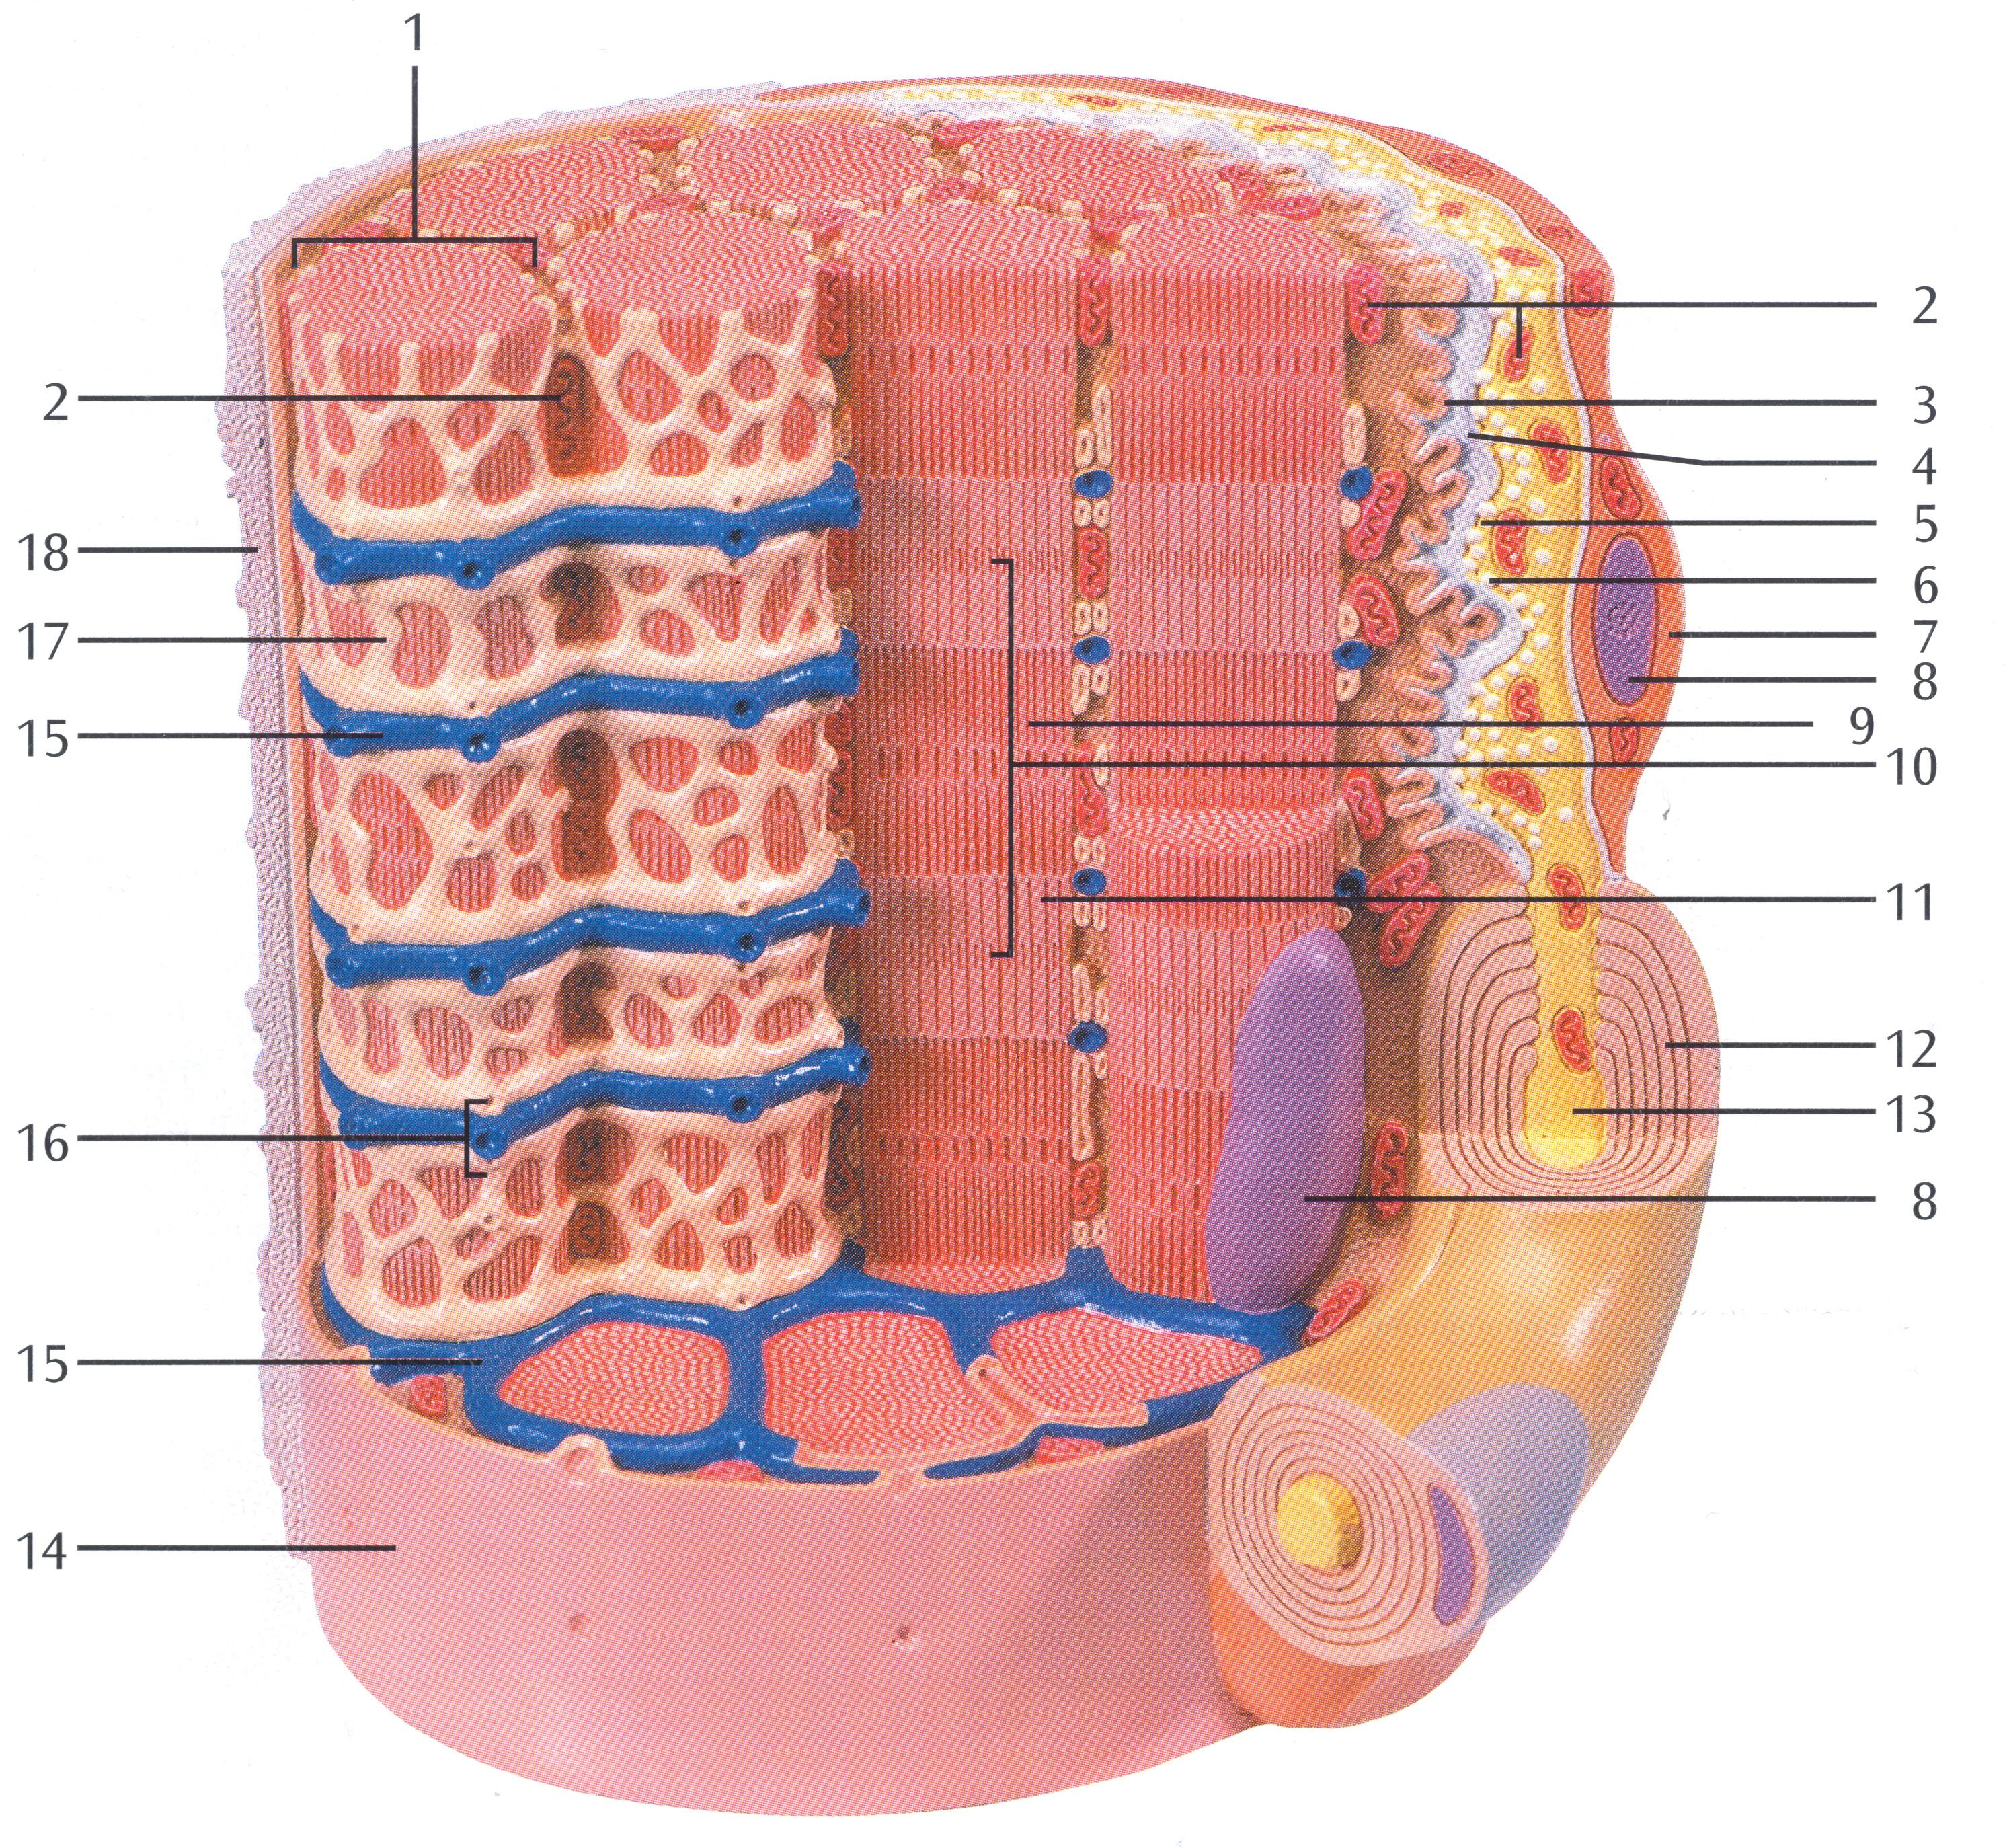 Skeletal Muscle Diagram Labeled Peg Perego Gator Wiring Fiber 1 Myofibrils 2 Mitochondrium 3